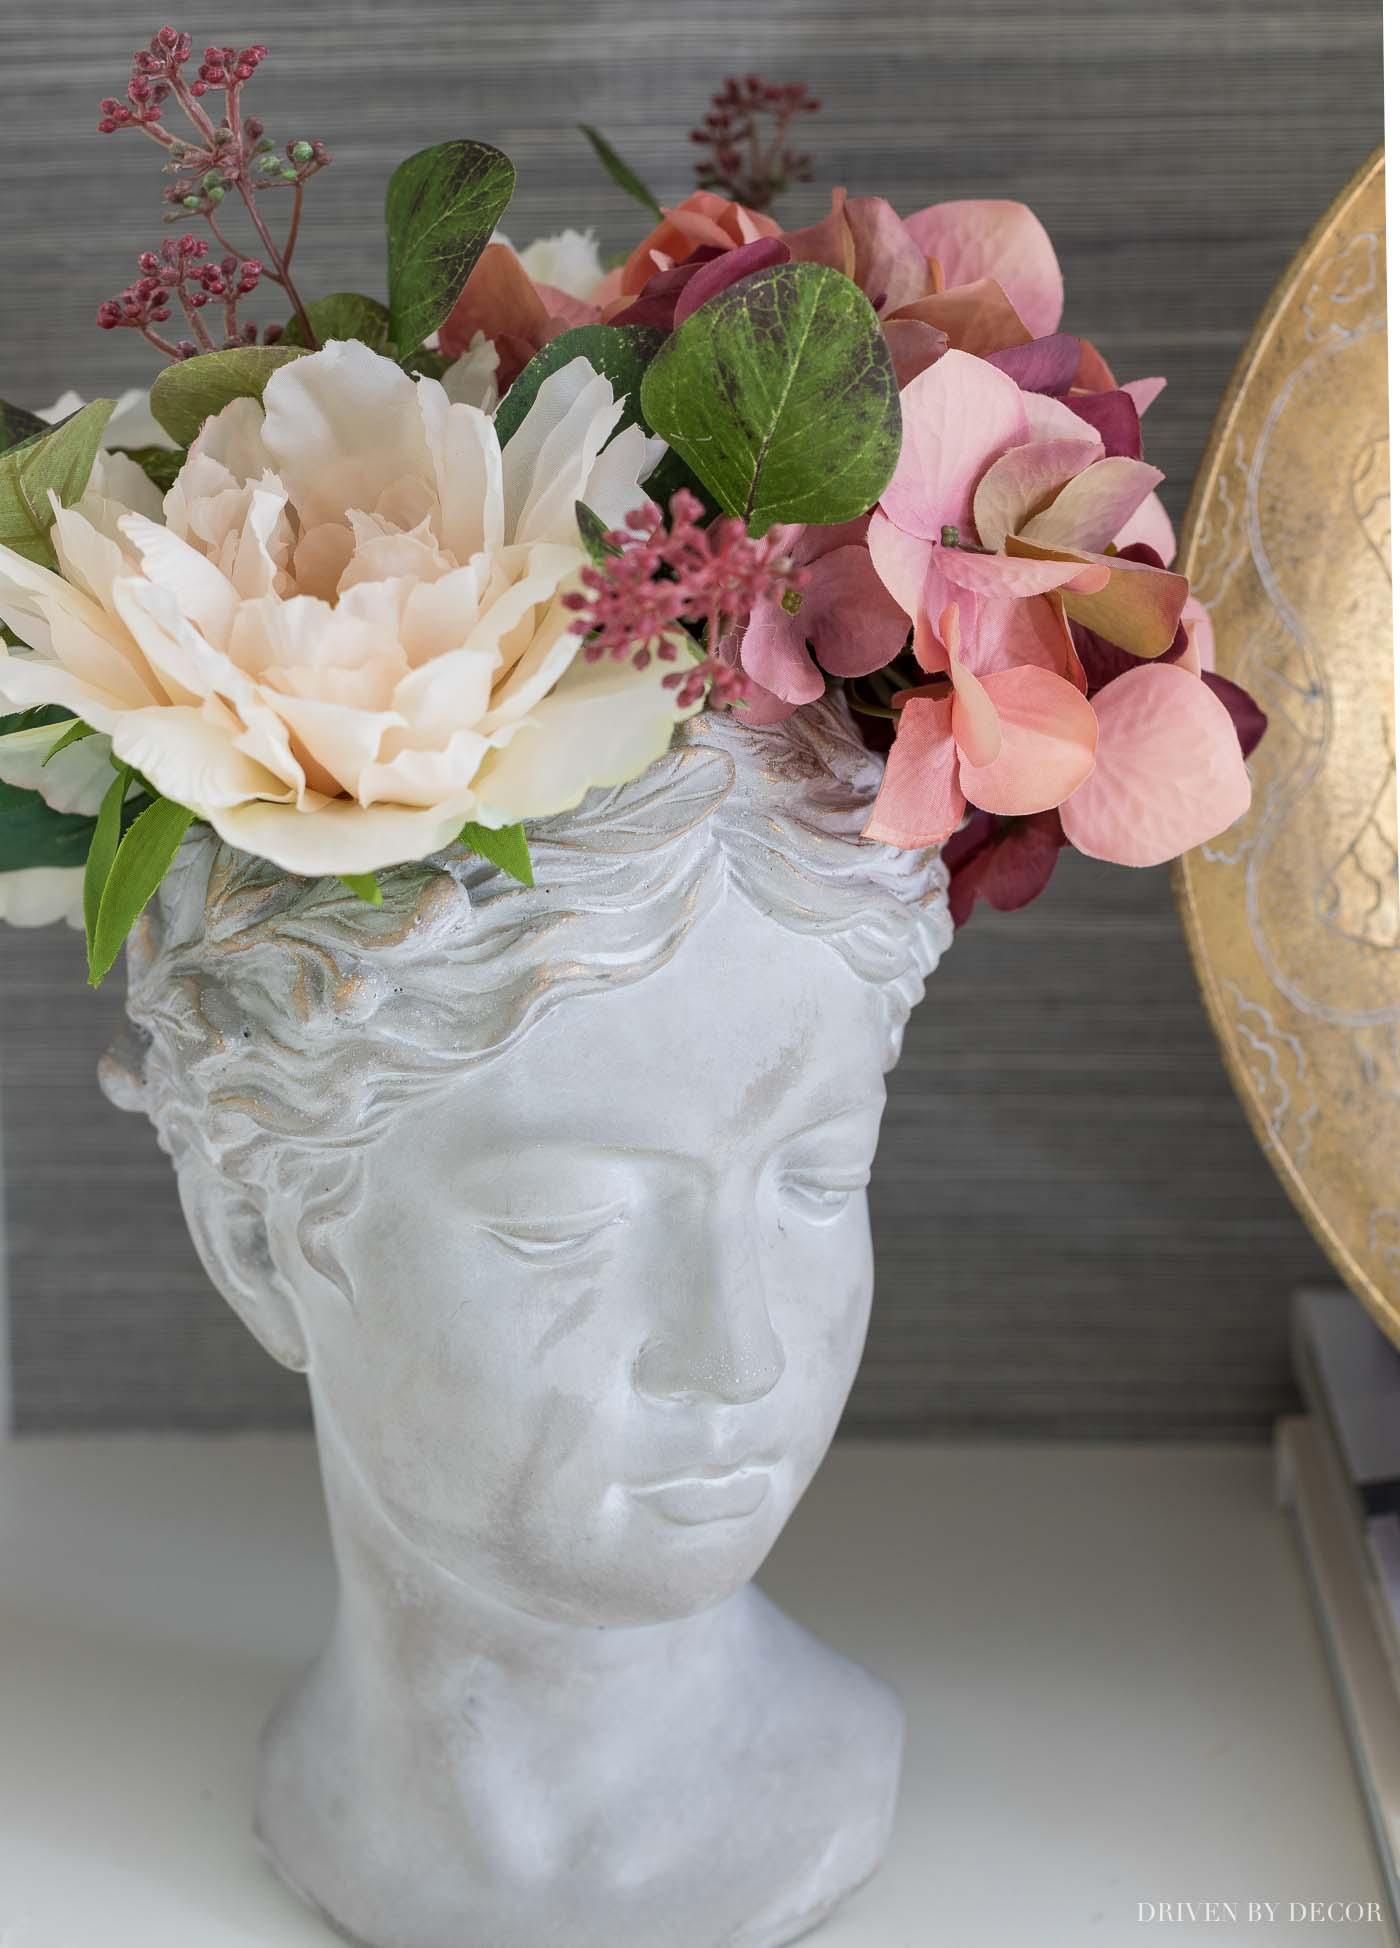 Faux fall flowers in the prettiest bust planter!